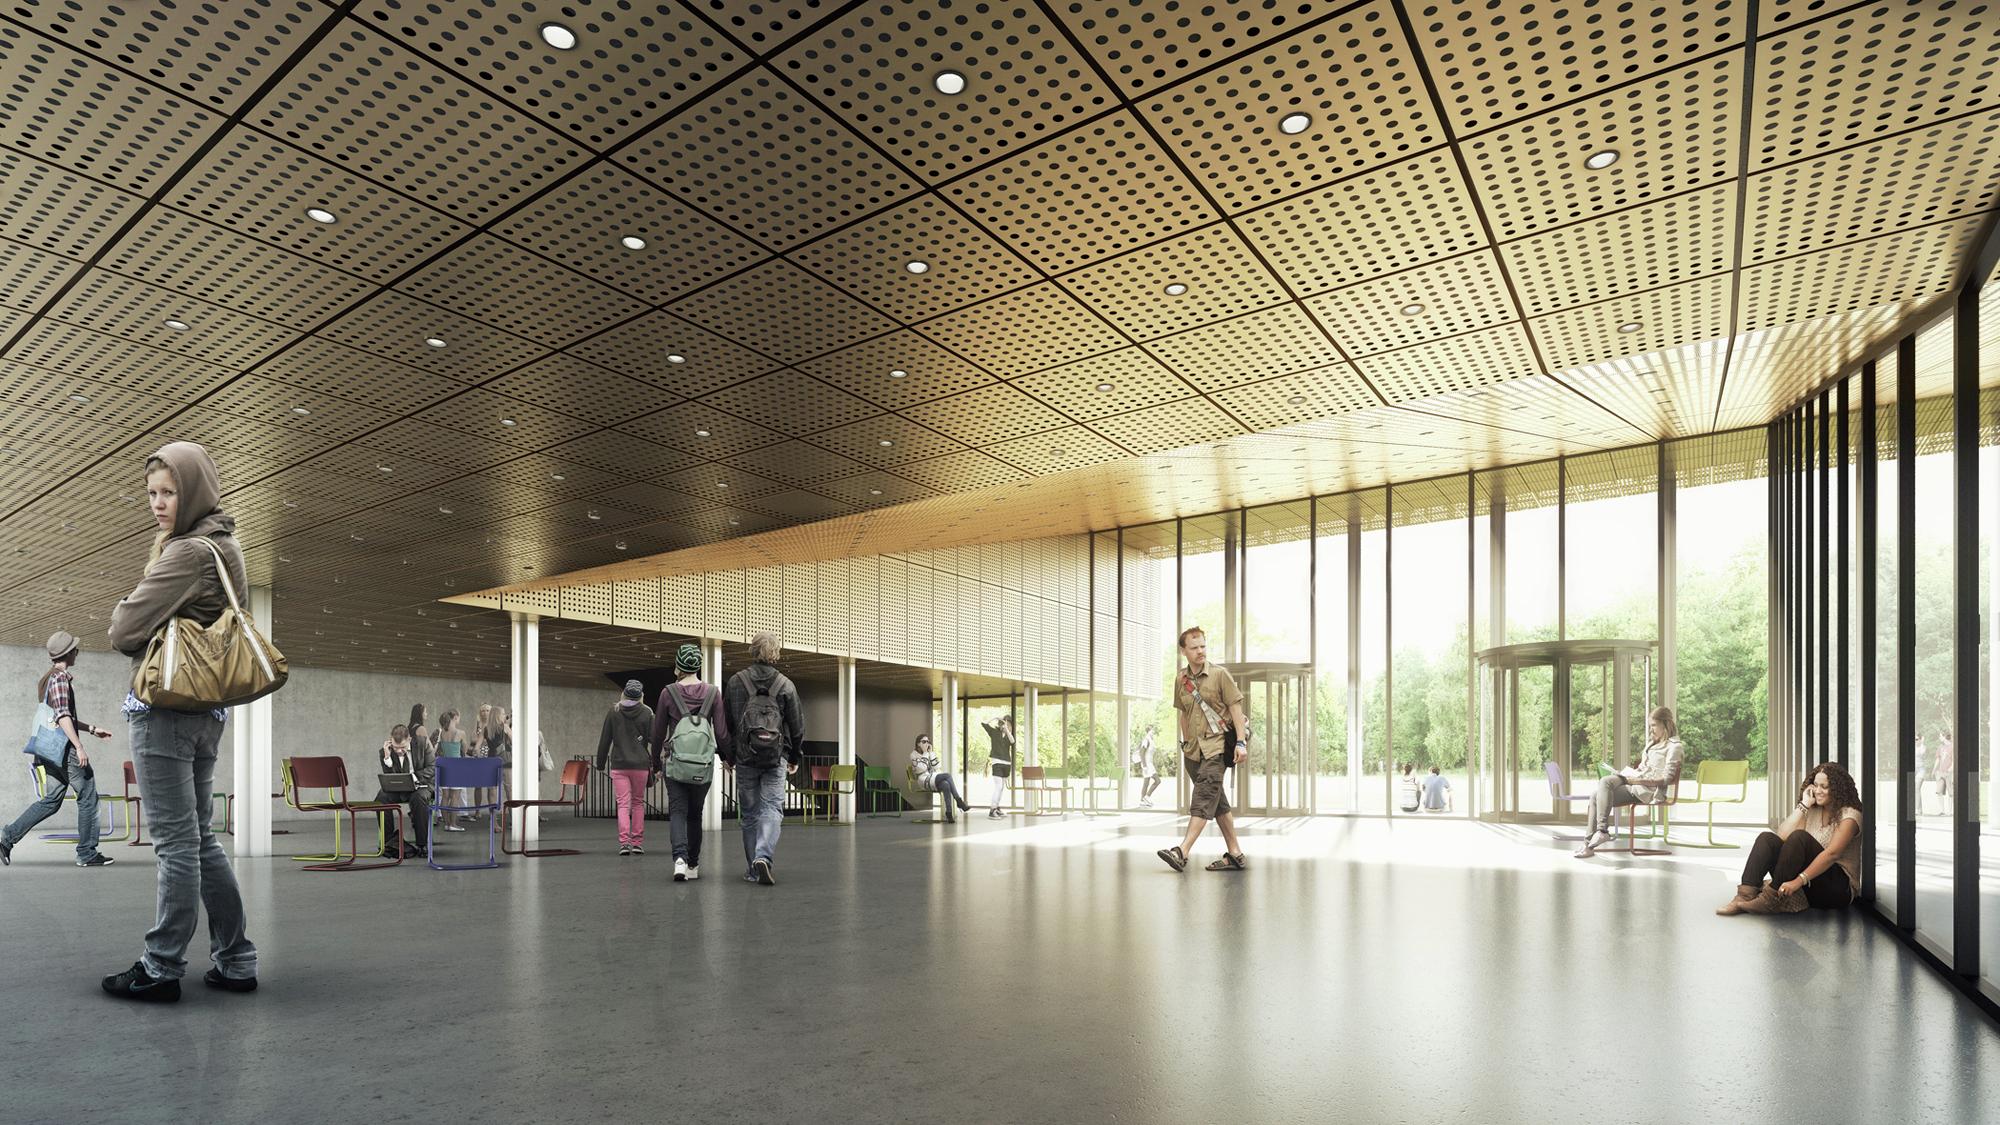 Foyer D Etudiant Architecture : Gallery of building o university antwerp auditorium